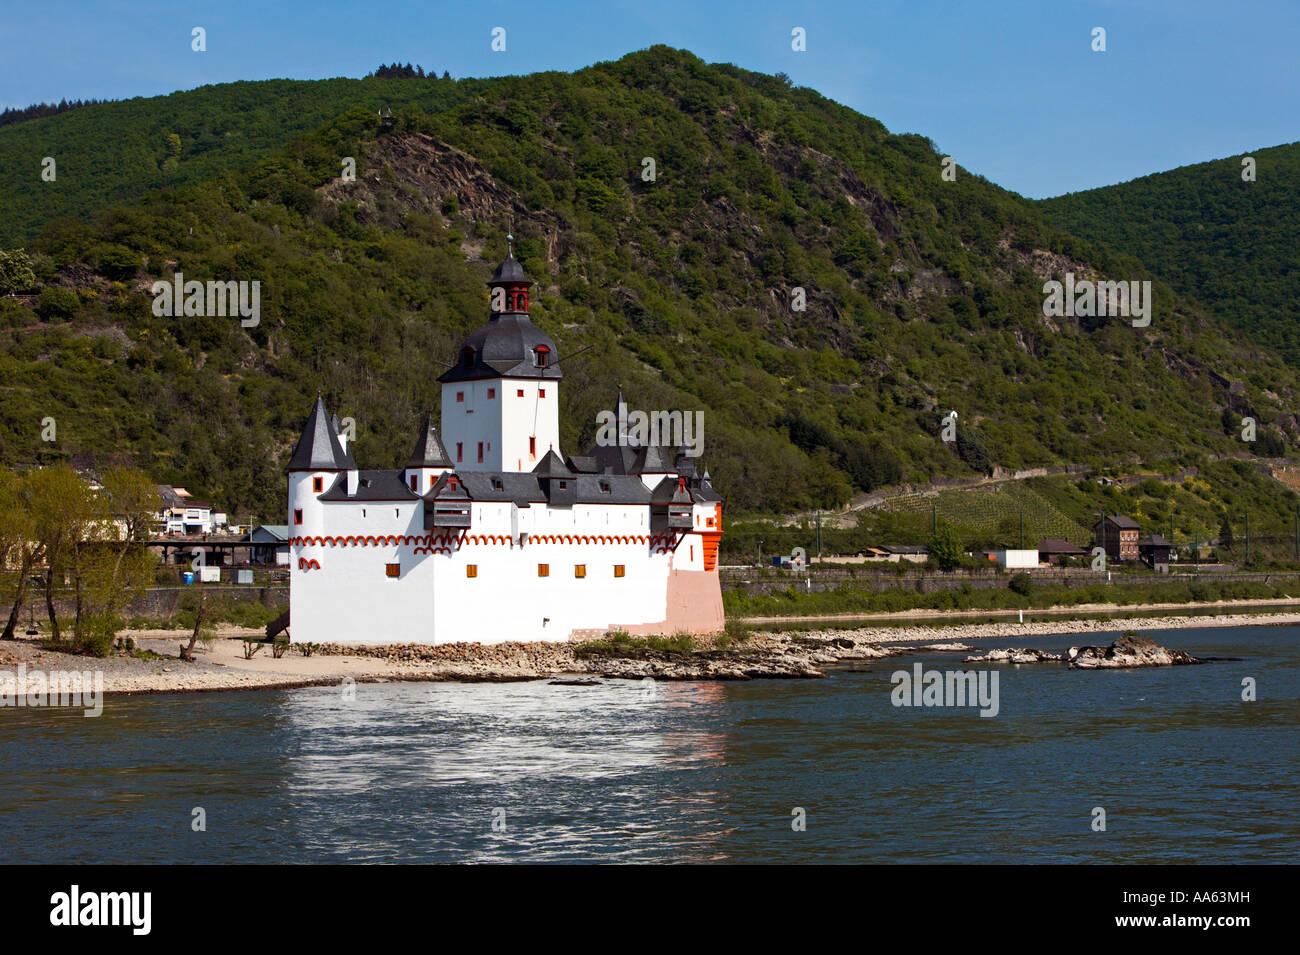 Castle Pfalz on the River Rhine, Rhineland, Germany, Europe Stock Photo